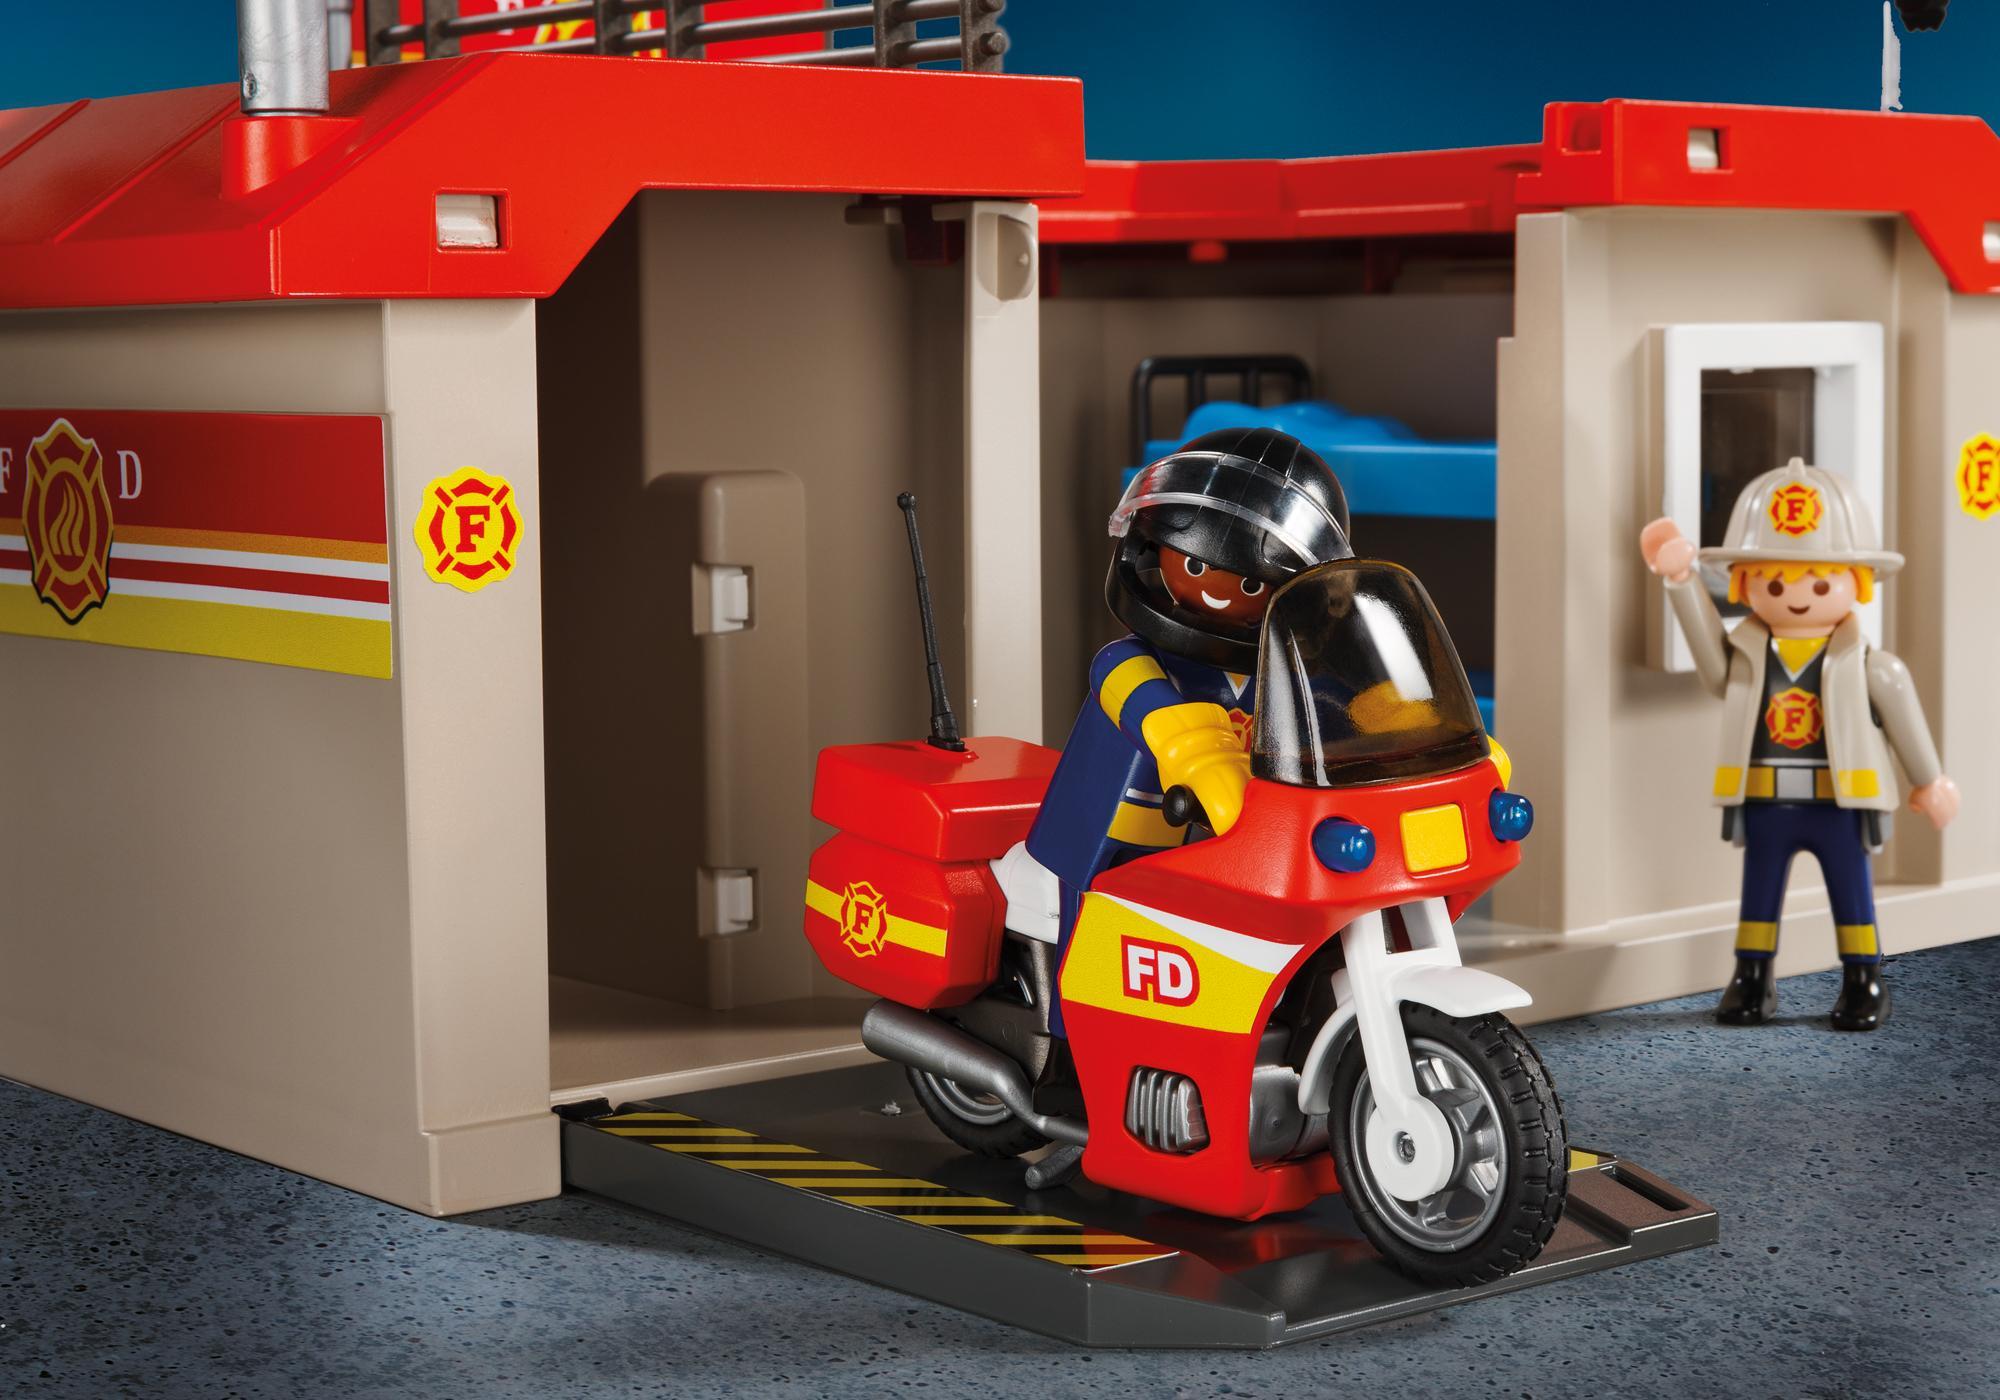 http://media.playmobil.com/i/playmobil/5663_product_extra2/Take Along Fire Station